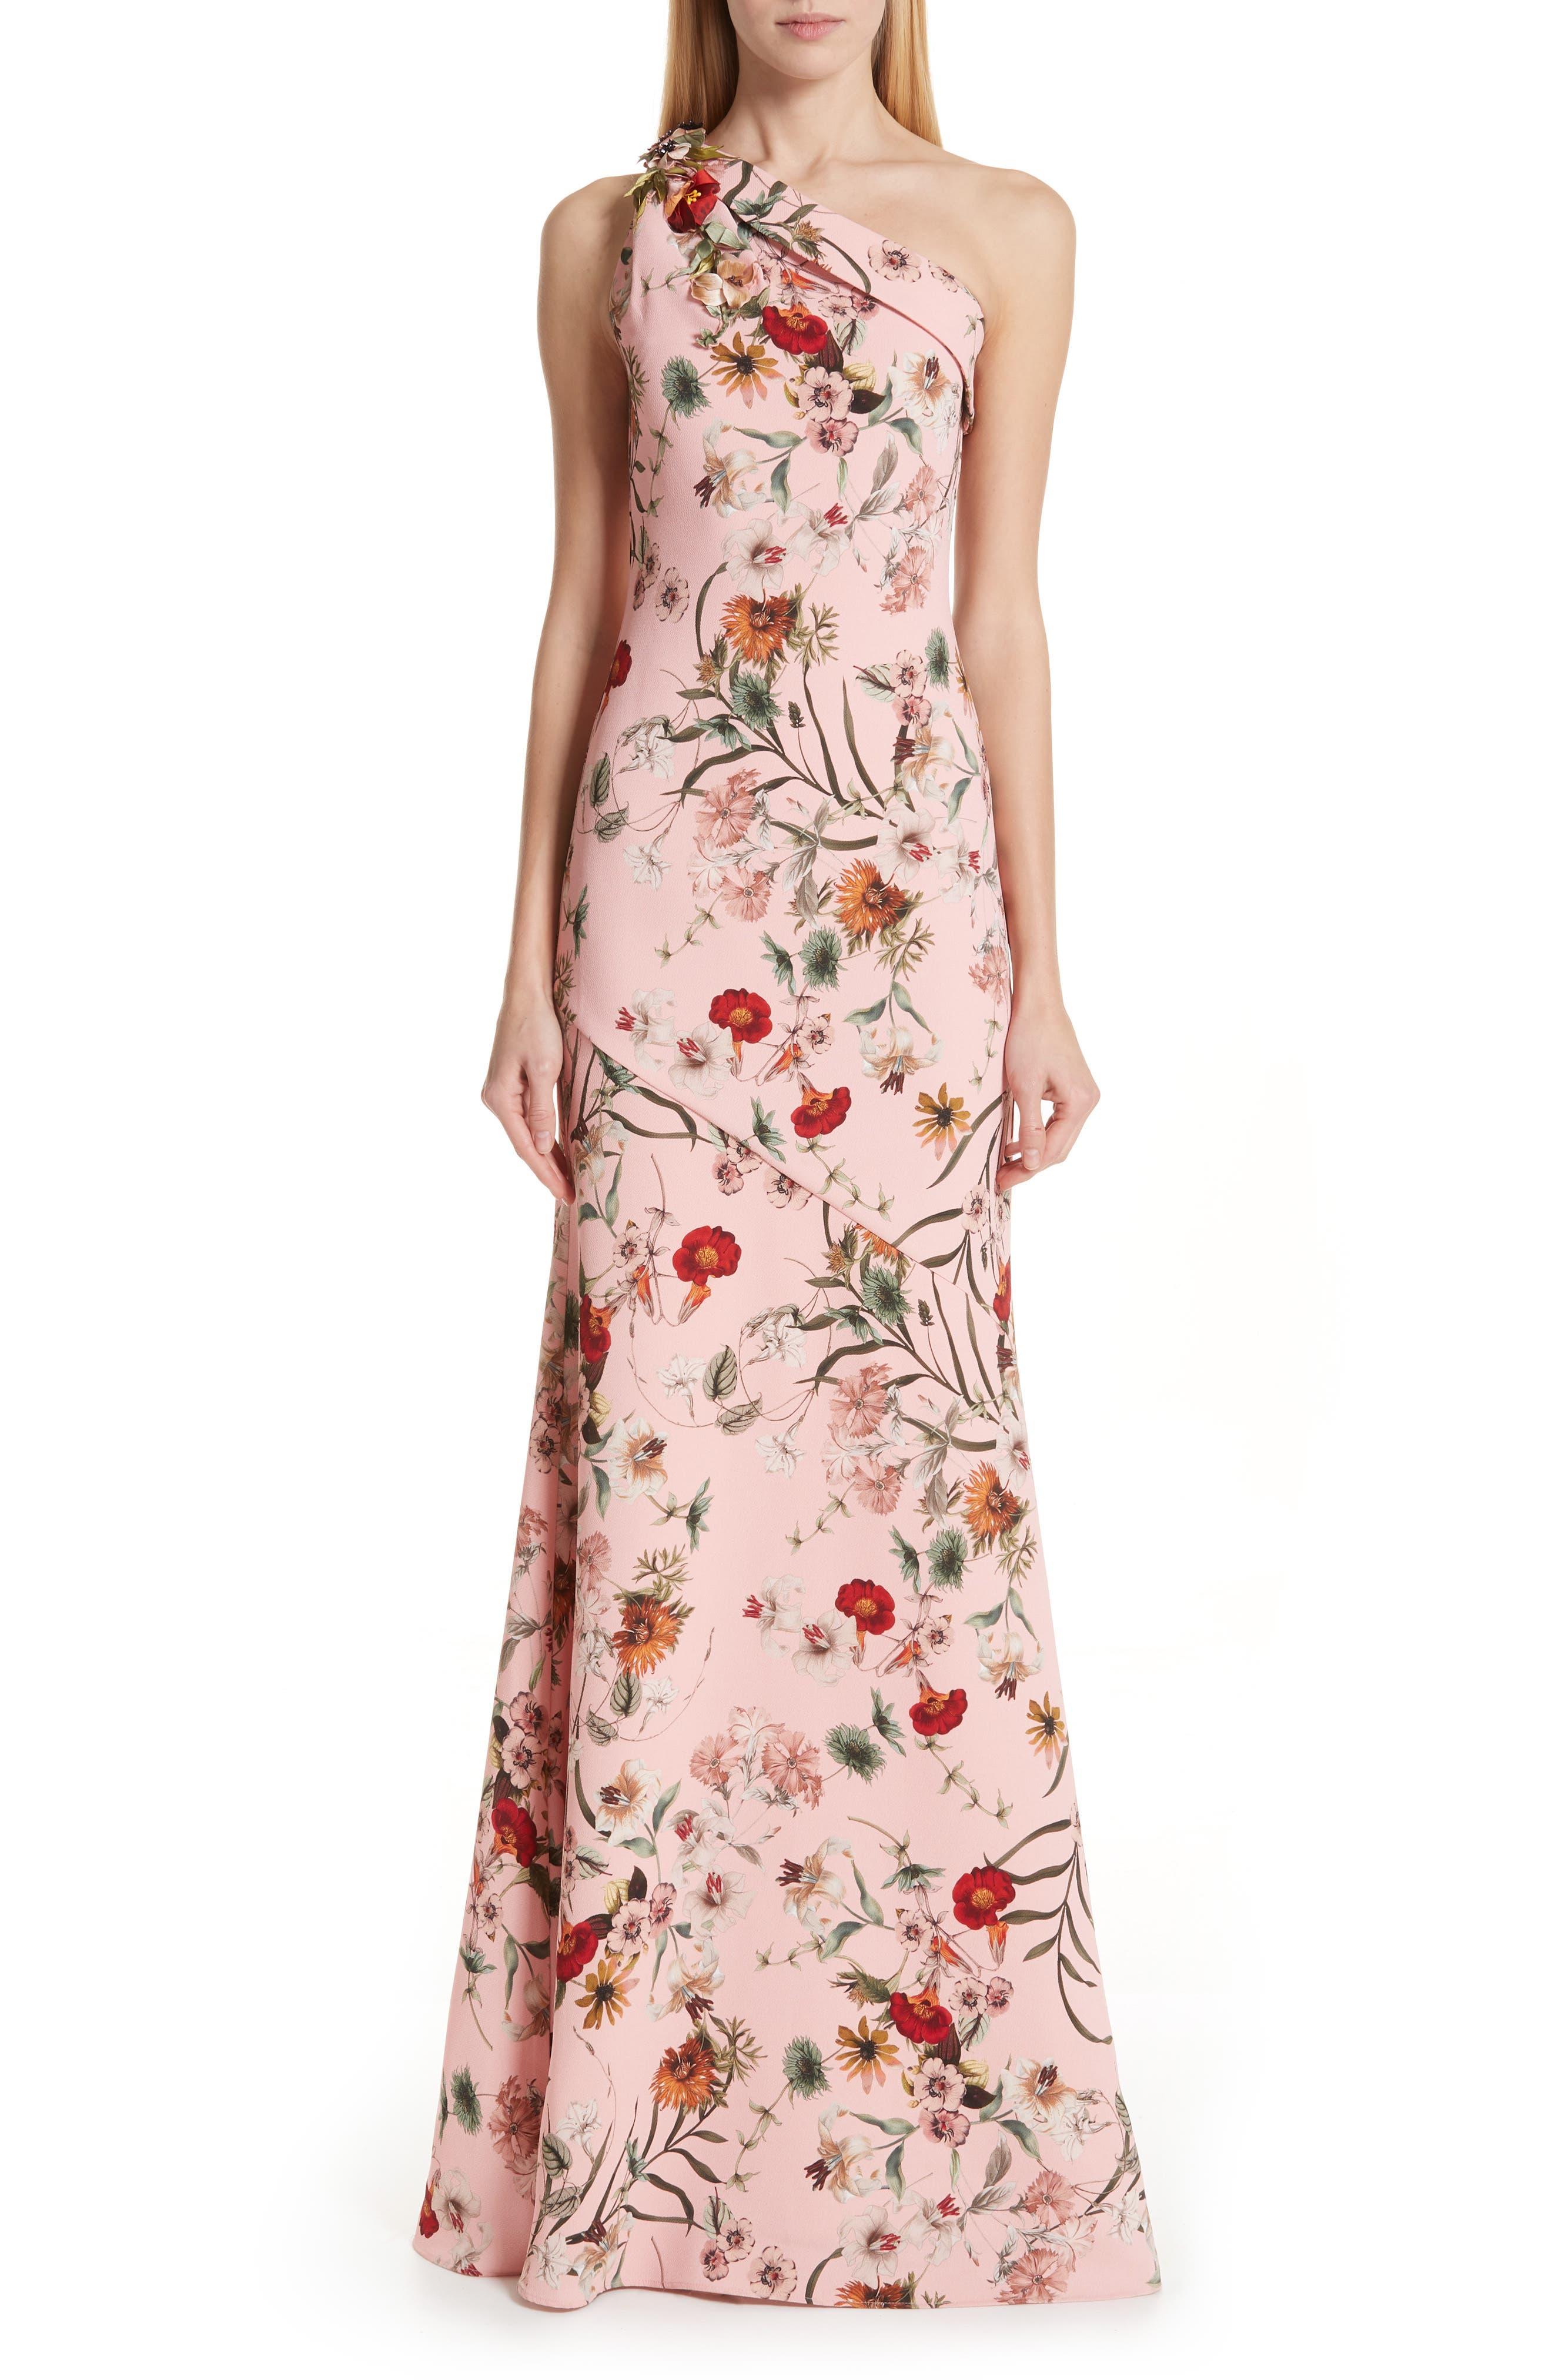 BADGLEY MISCHKA COLLECTION Badgley Mischka One-Shoulder Floral Evening Dress, Main, color, 650